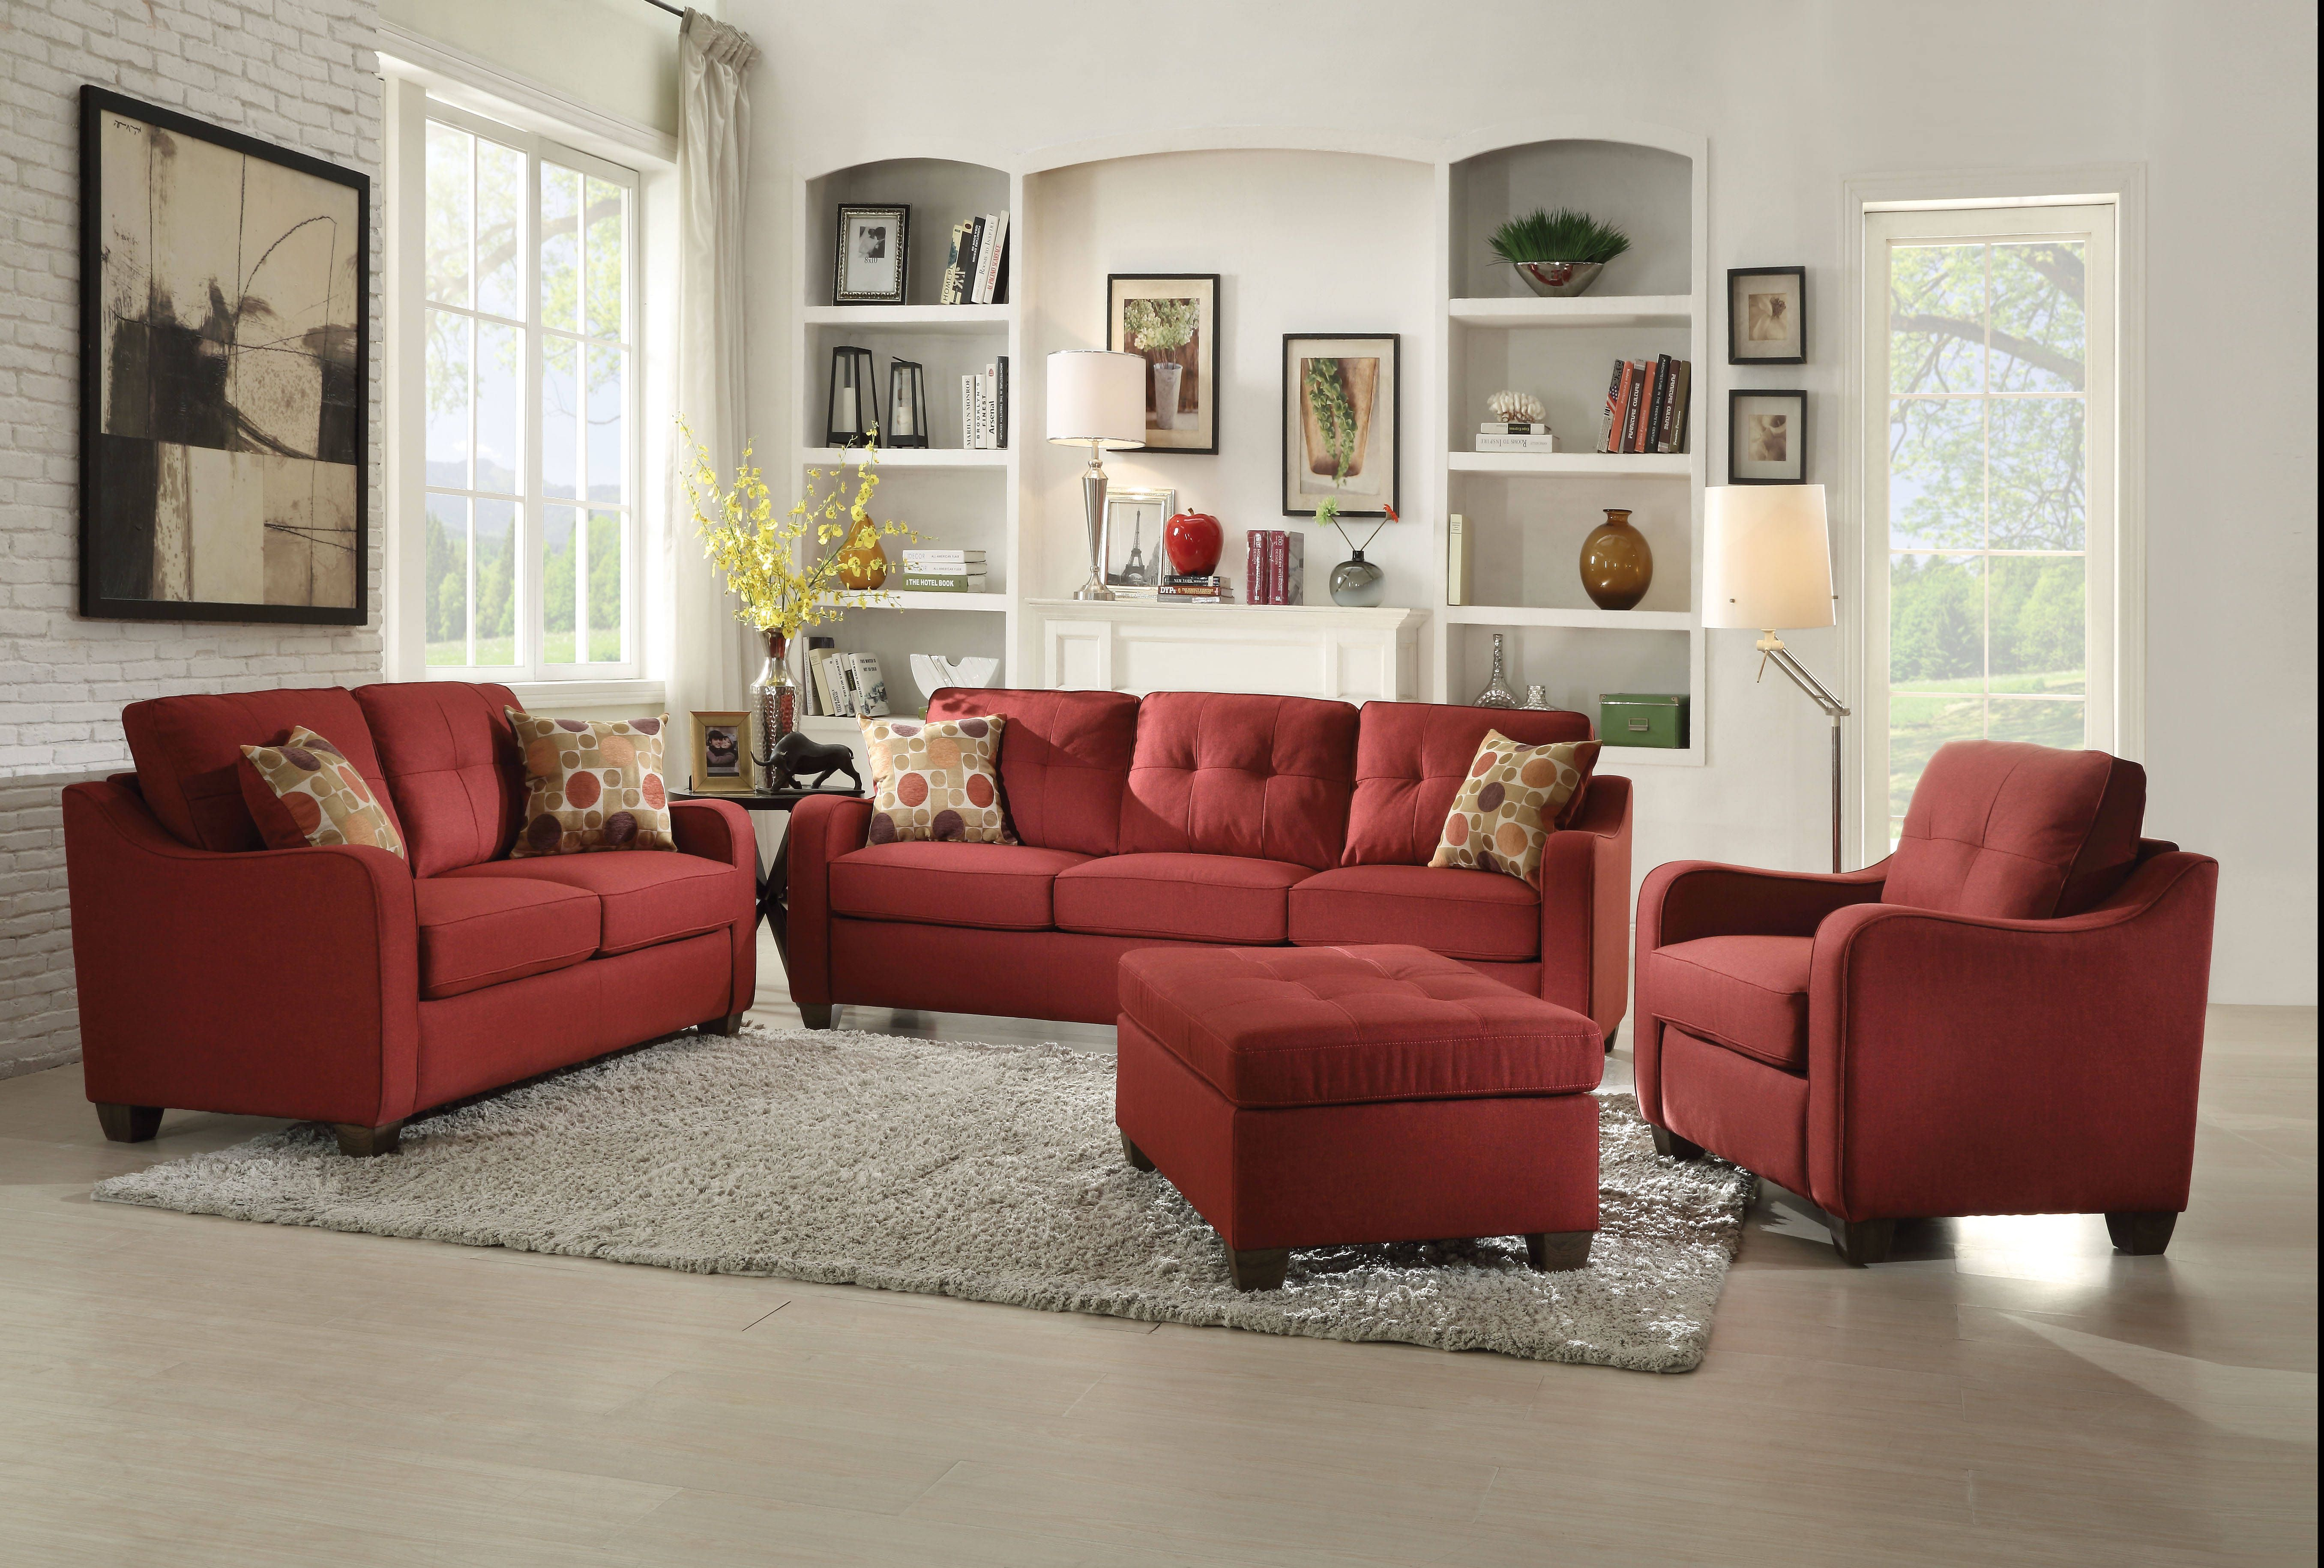 Cleavon ii modern red gray fabric wood foam living room set